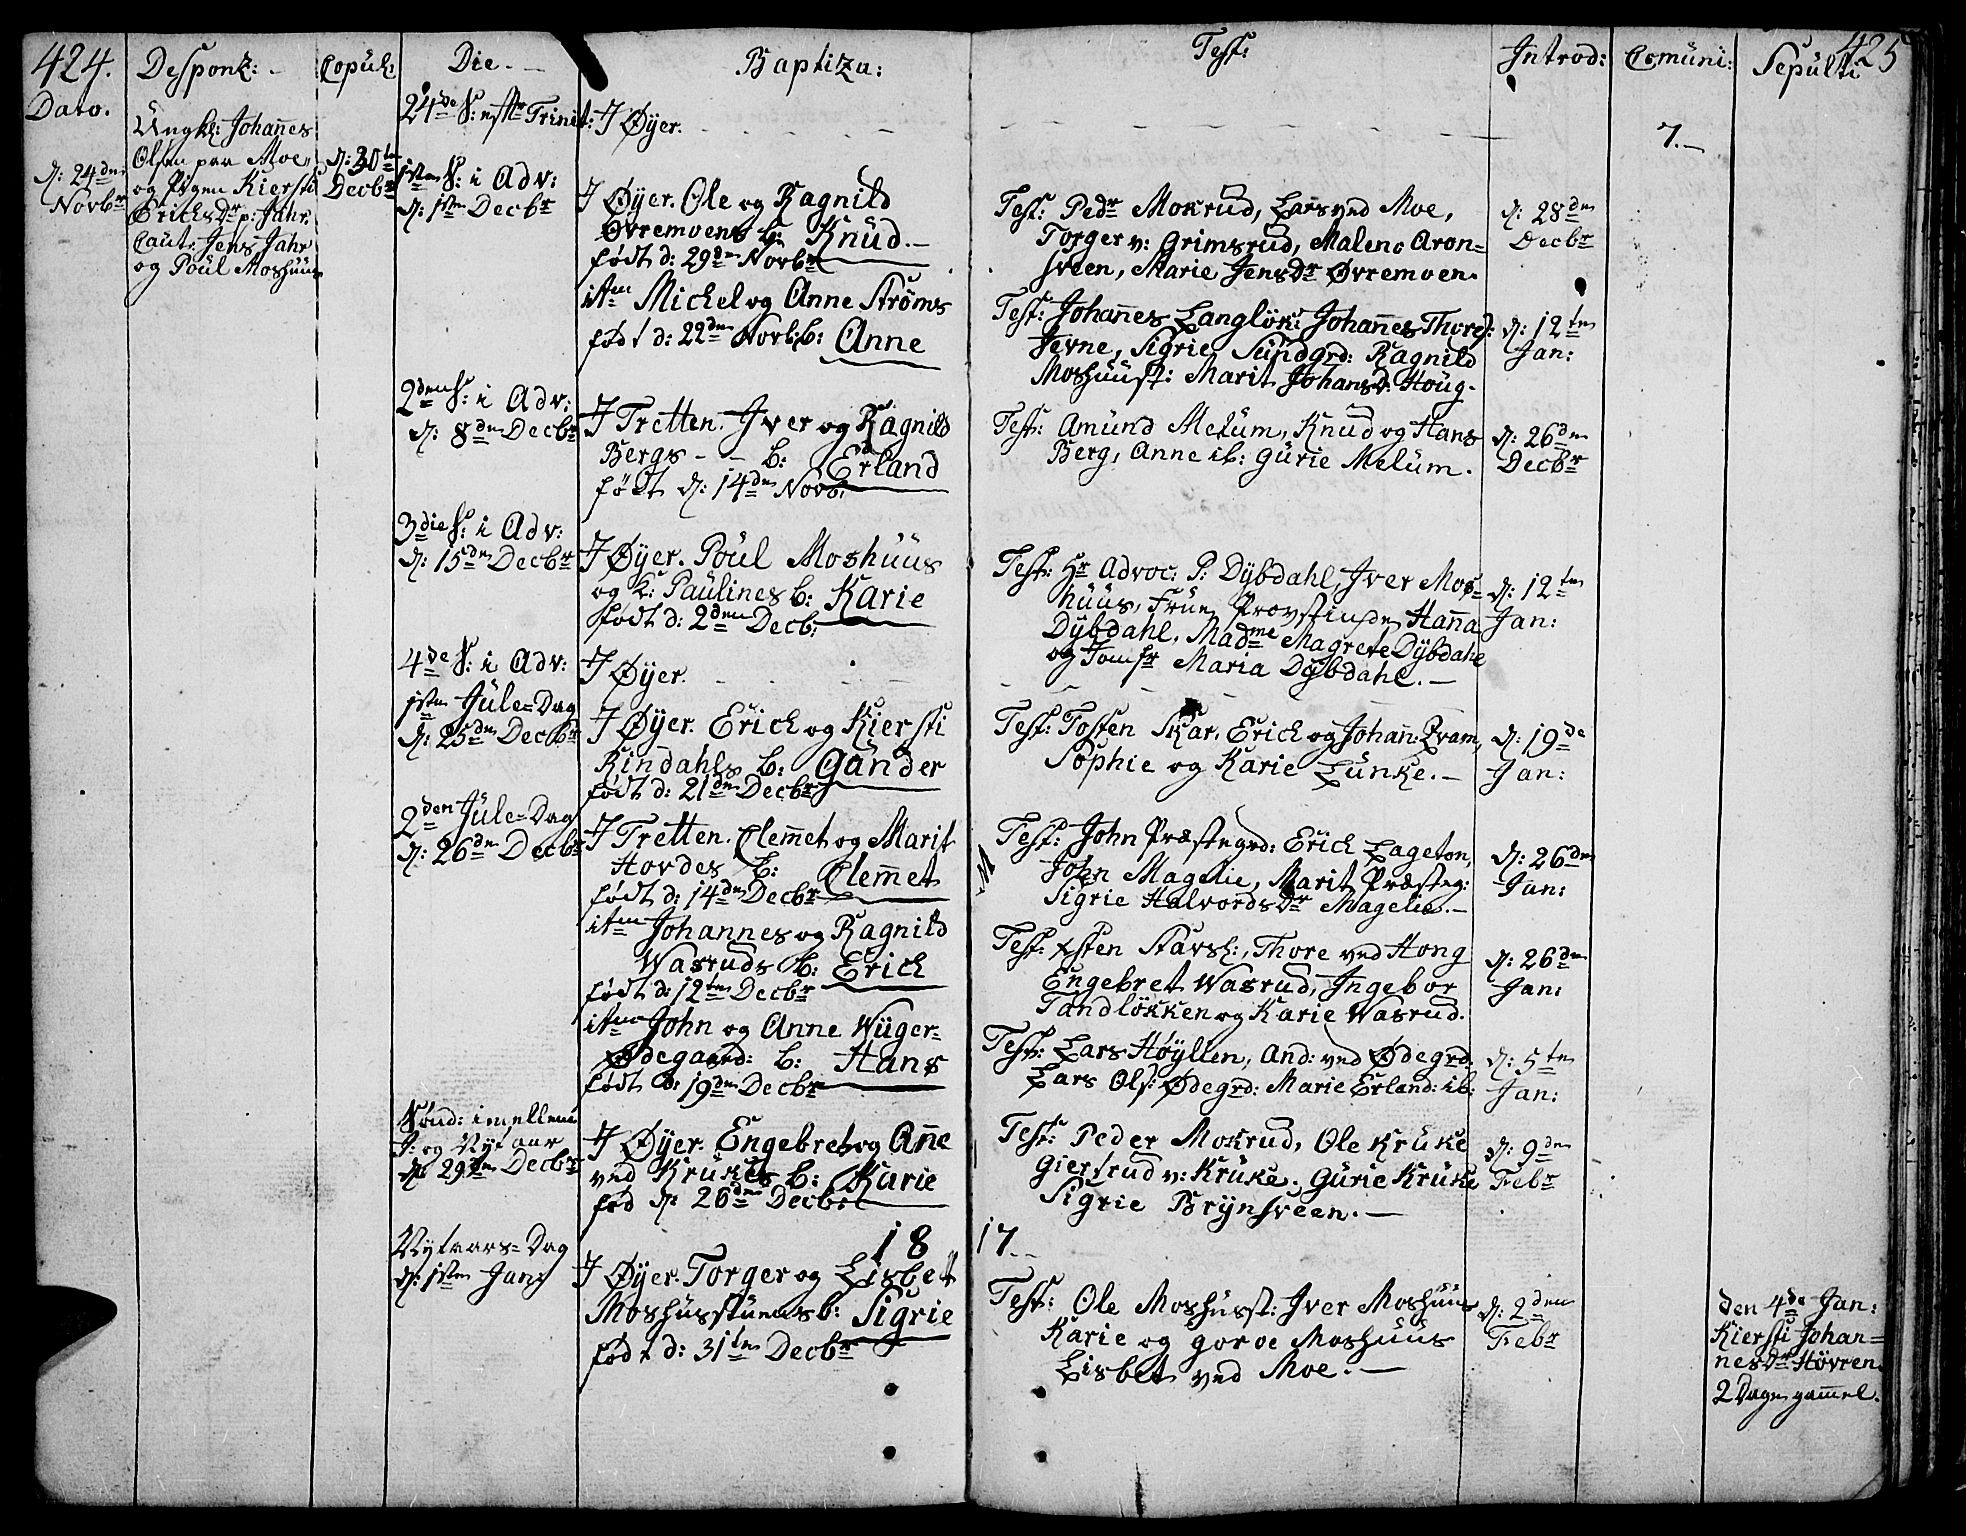 SAH, Øyer prestekontor, Ministerialbok nr. 3, 1784-1824, s. 424-425